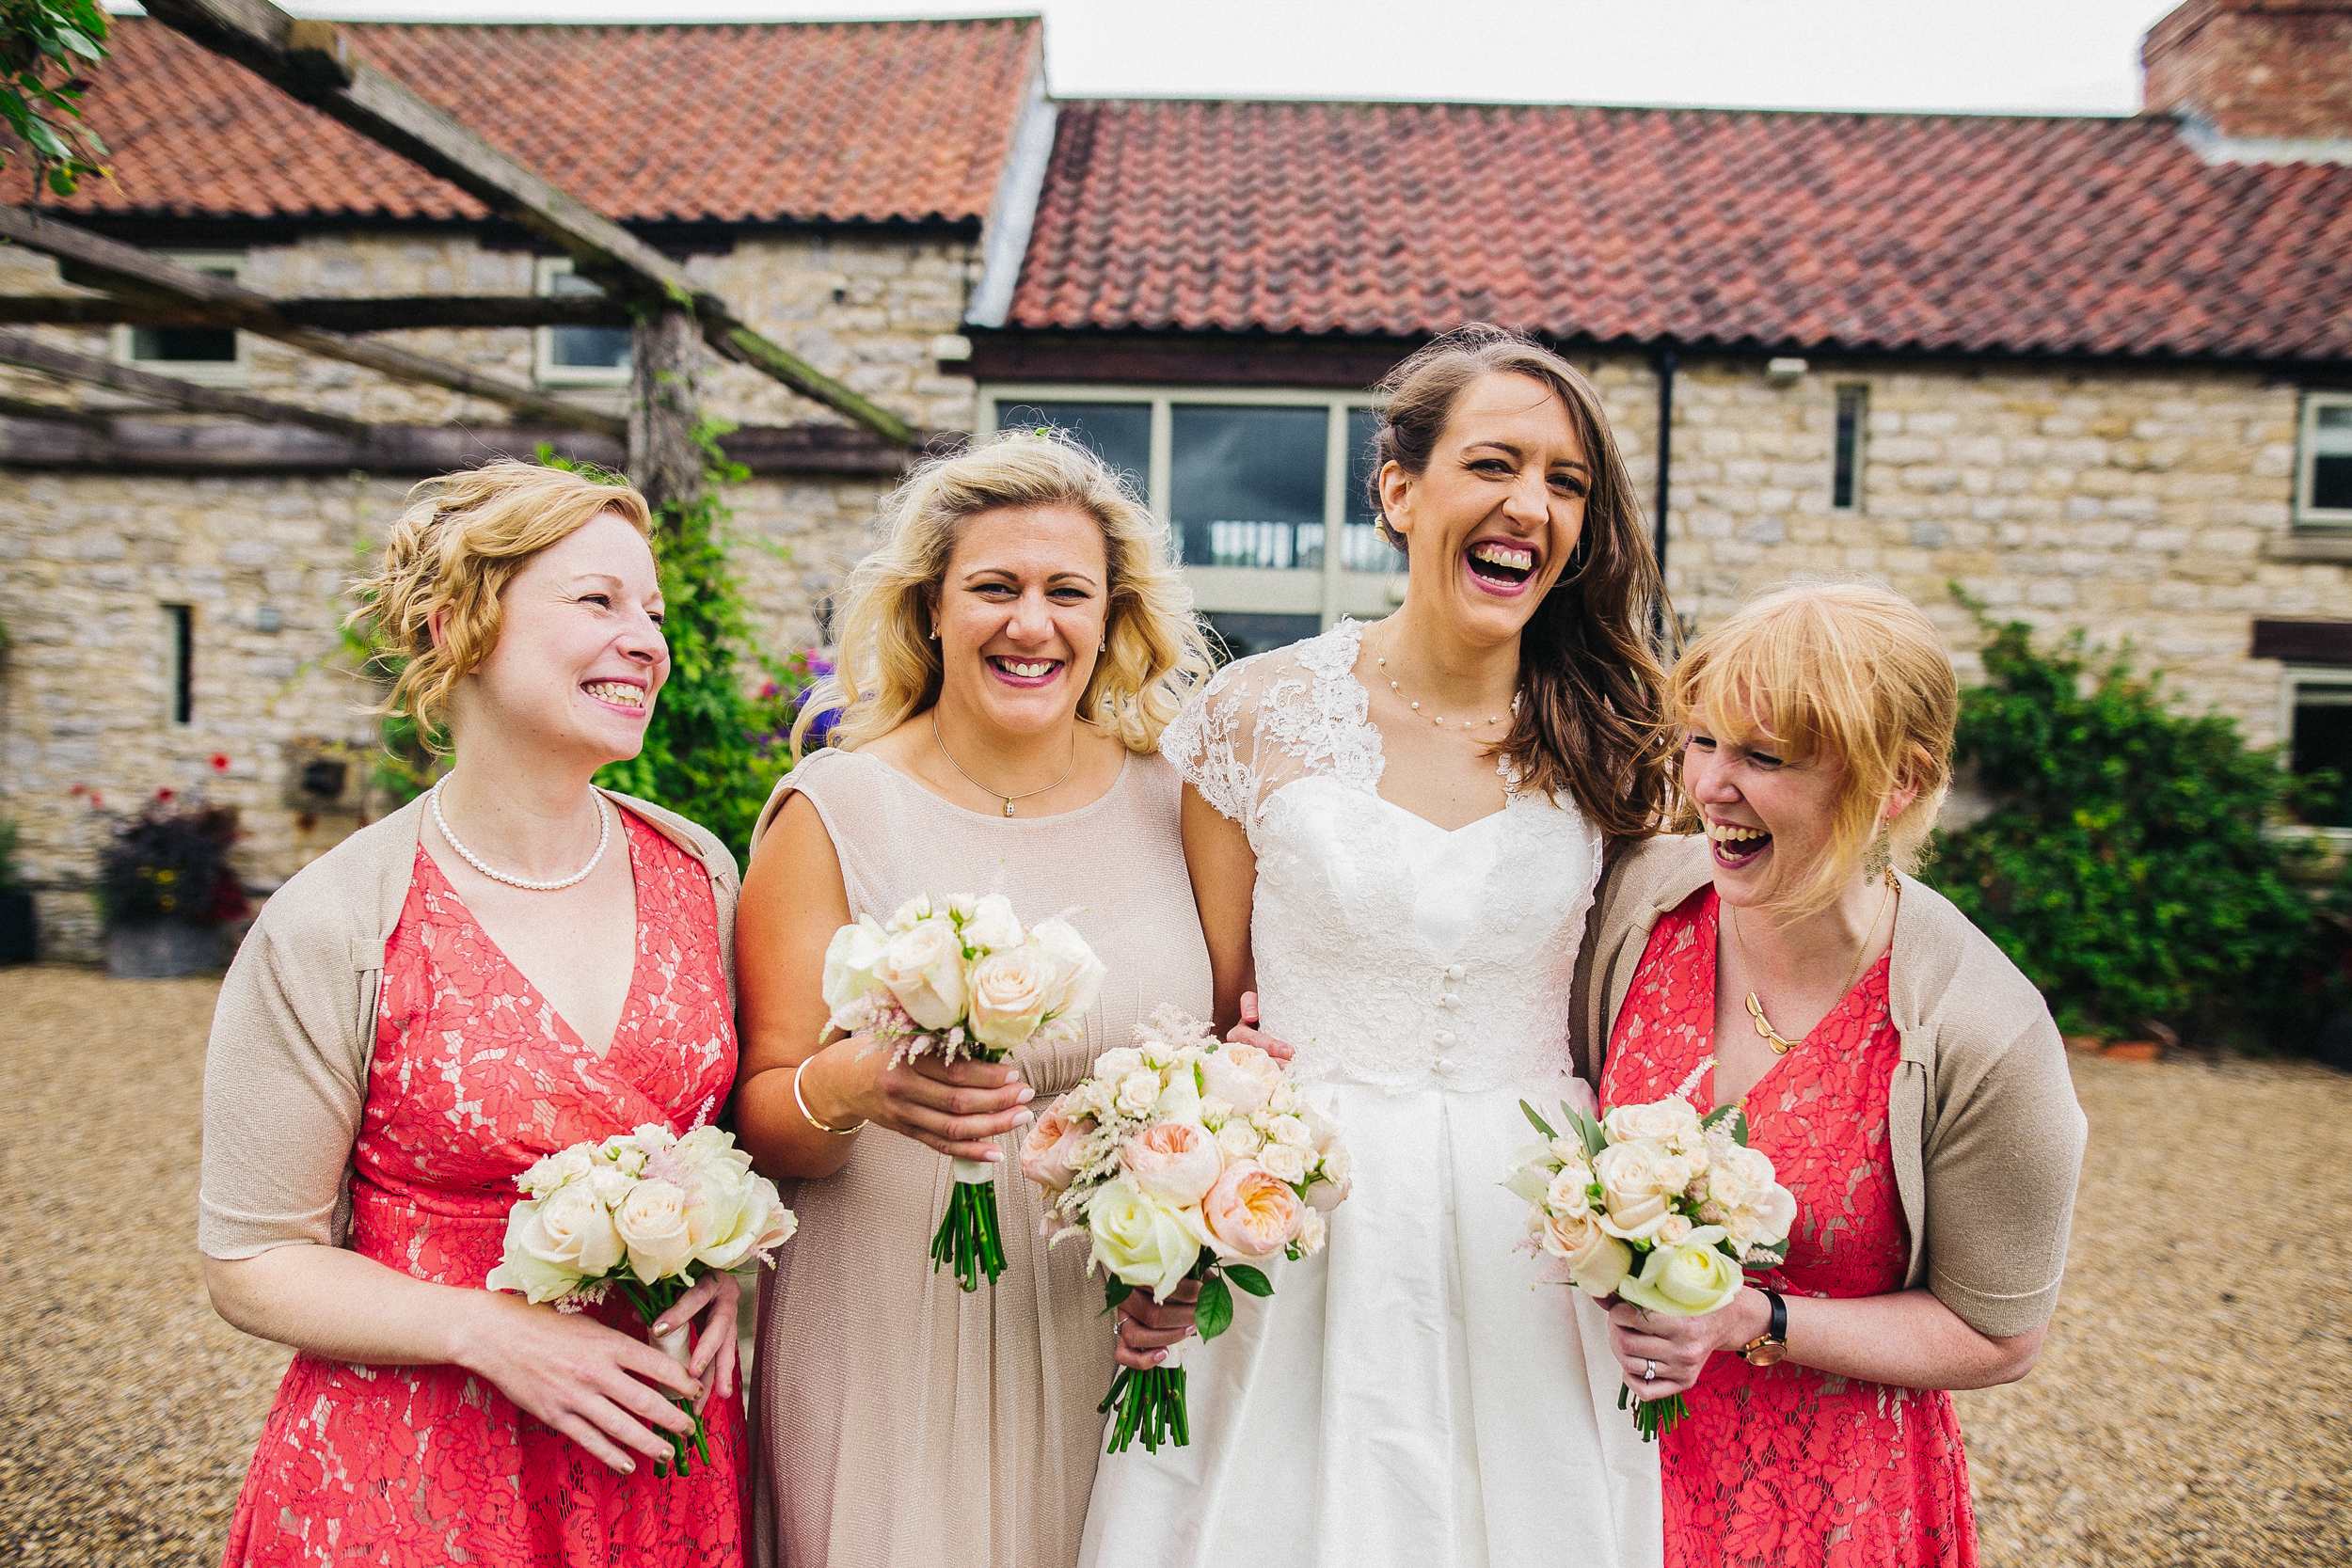 creative-wedding-photography-teesside-north-east-yorkshire-104.jpg